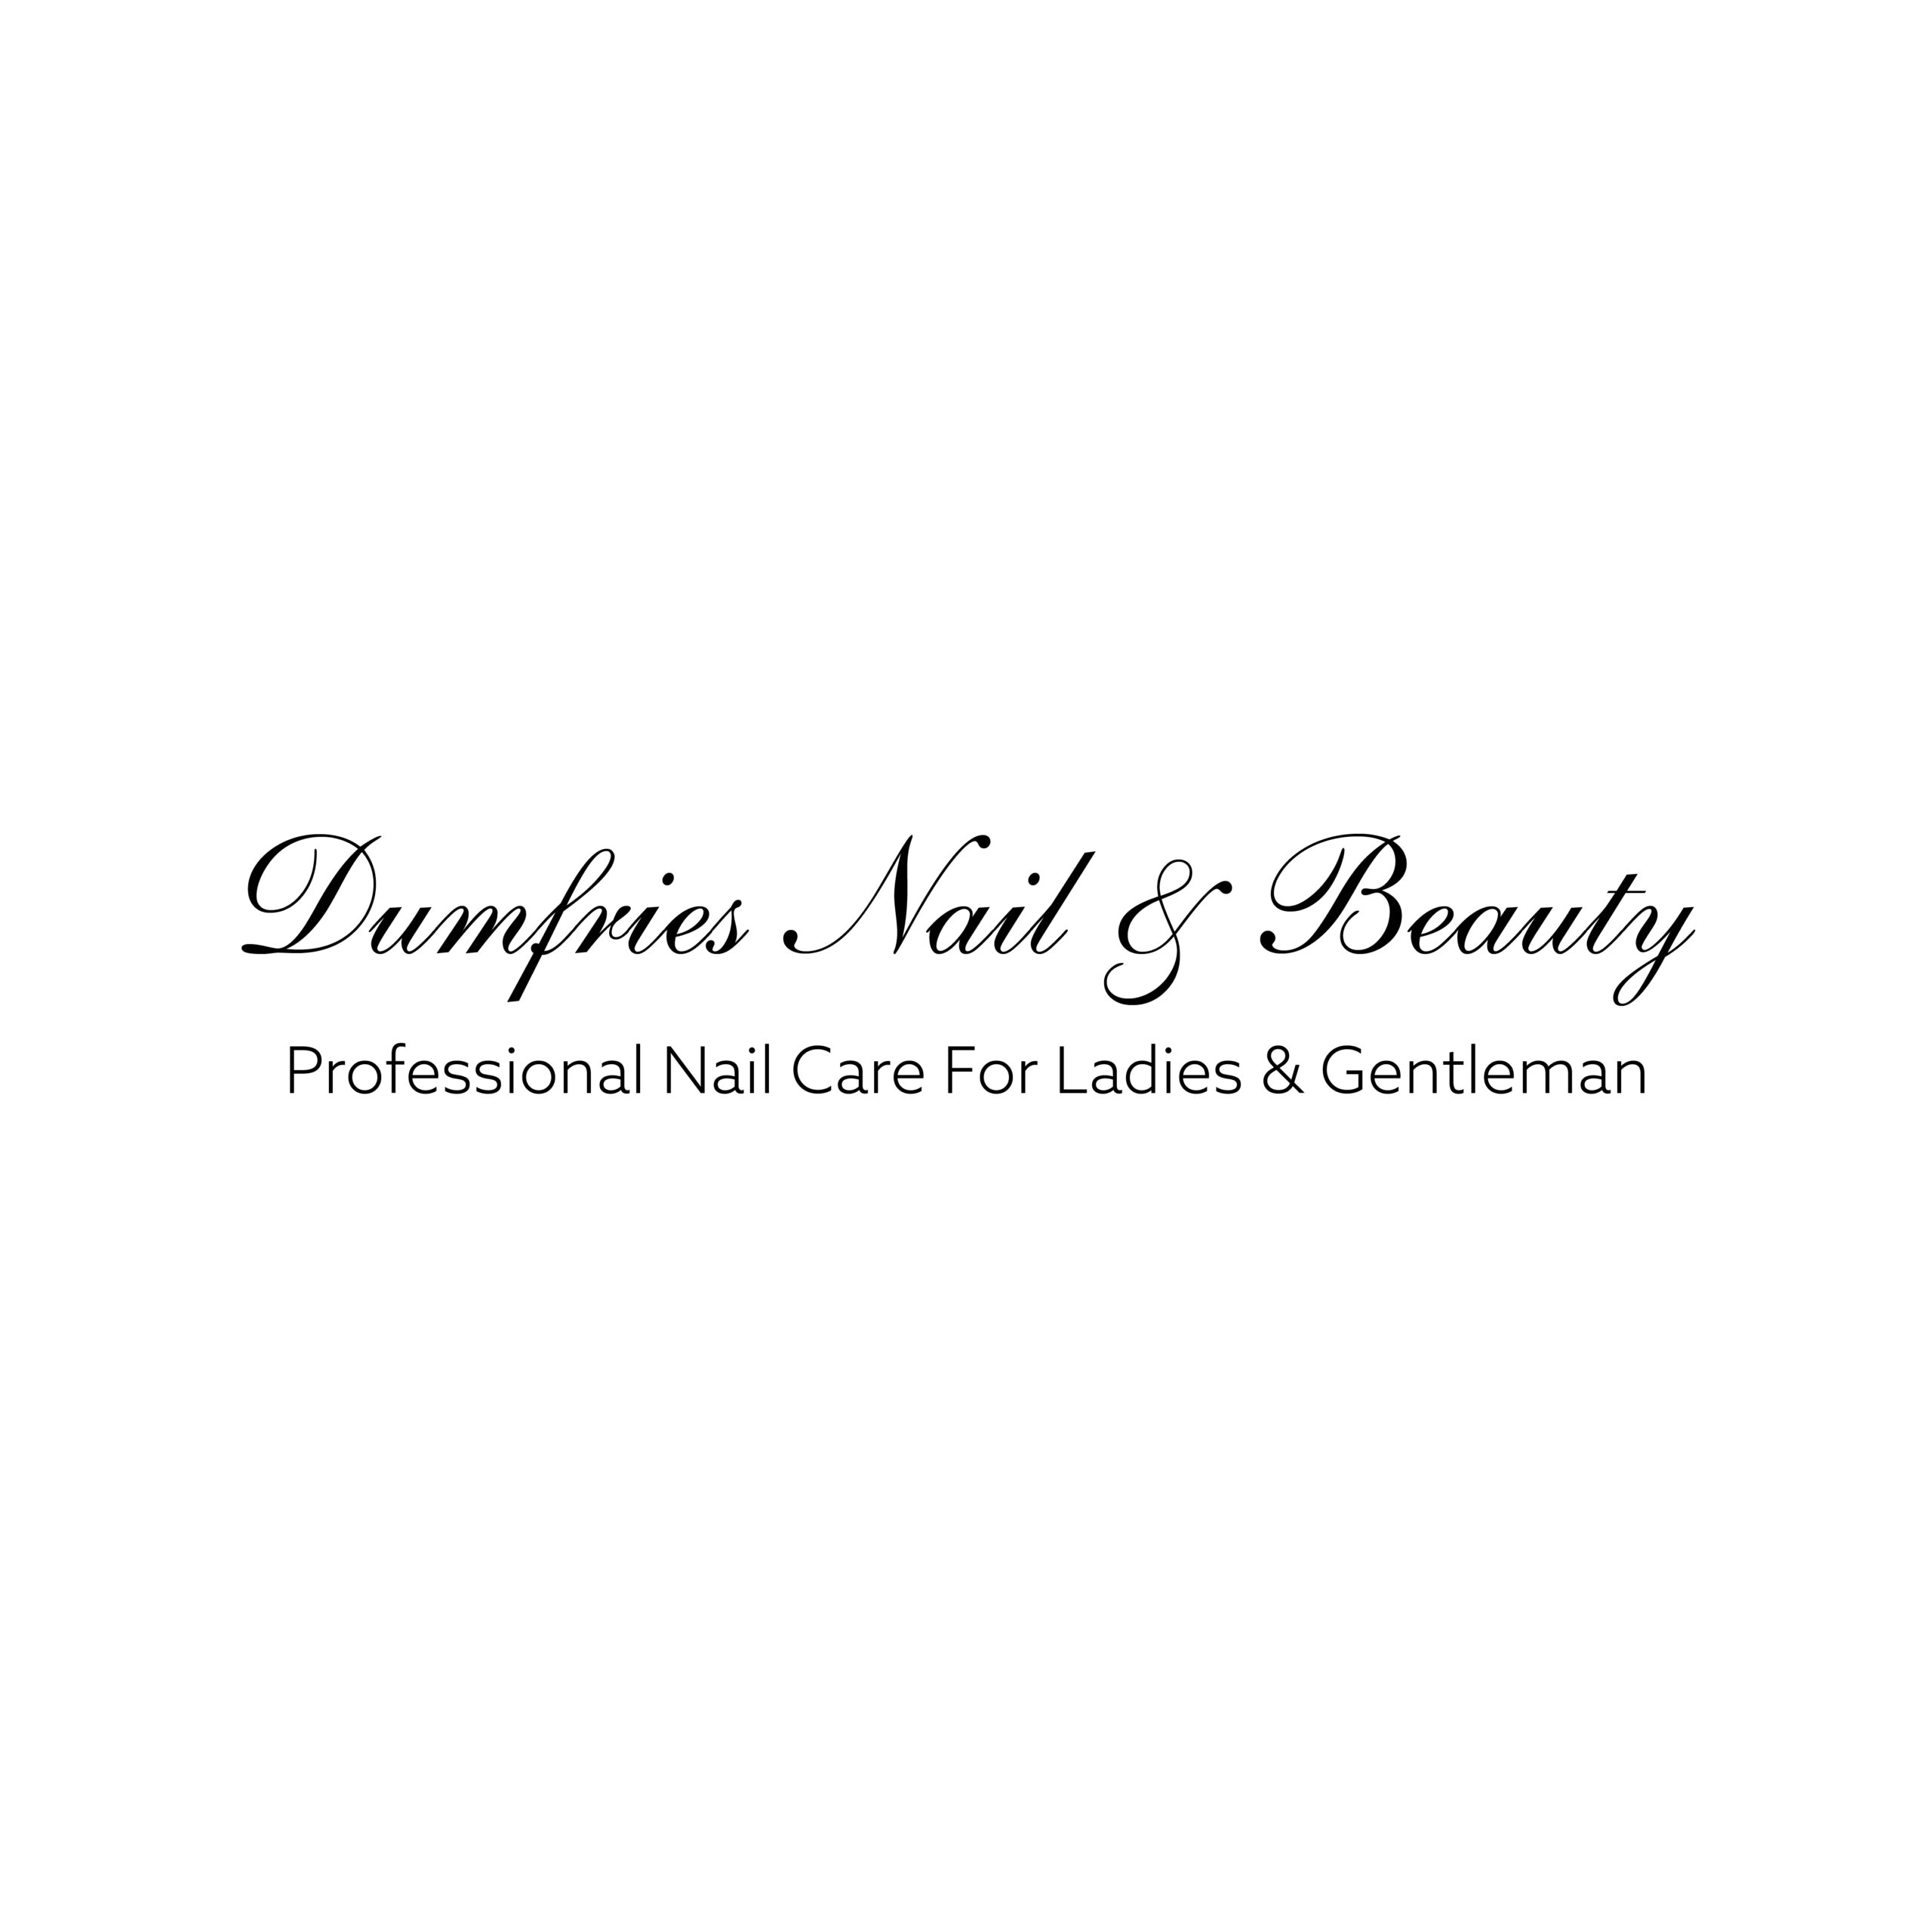 Dumfries Nail & Beauty